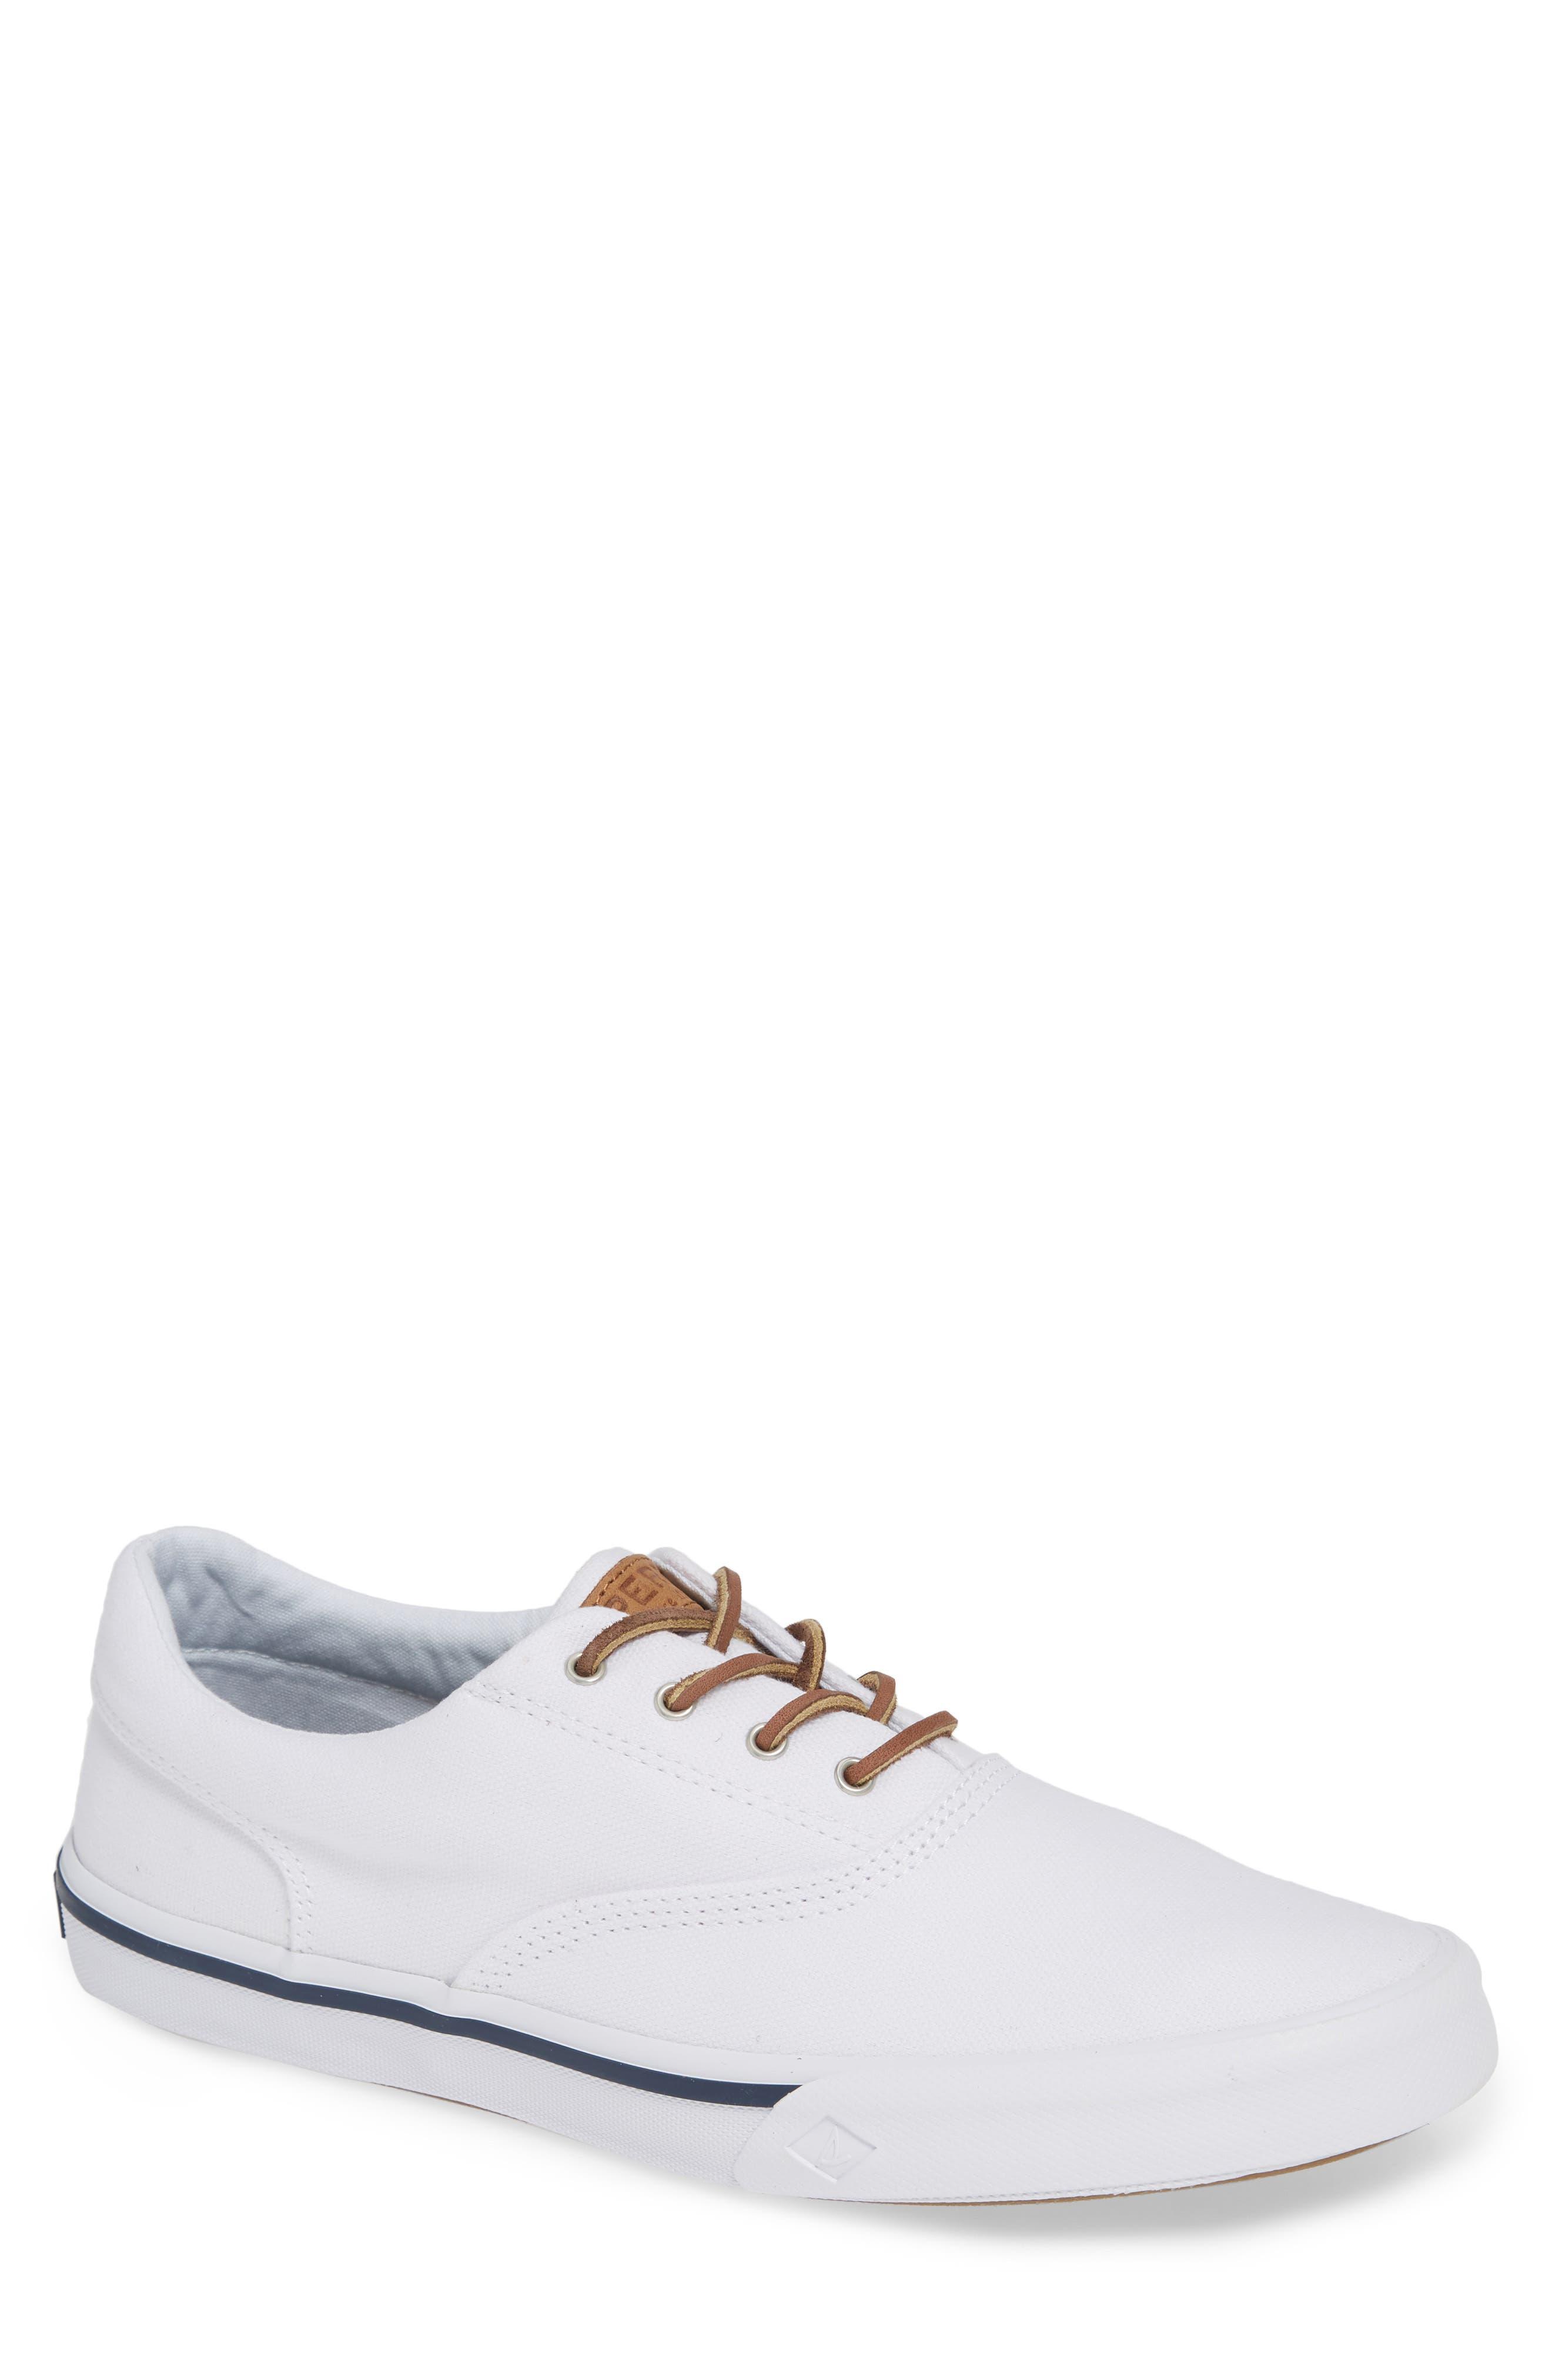 Striper 2 CVO Sneaker,                             Main thumbnail 2, color,